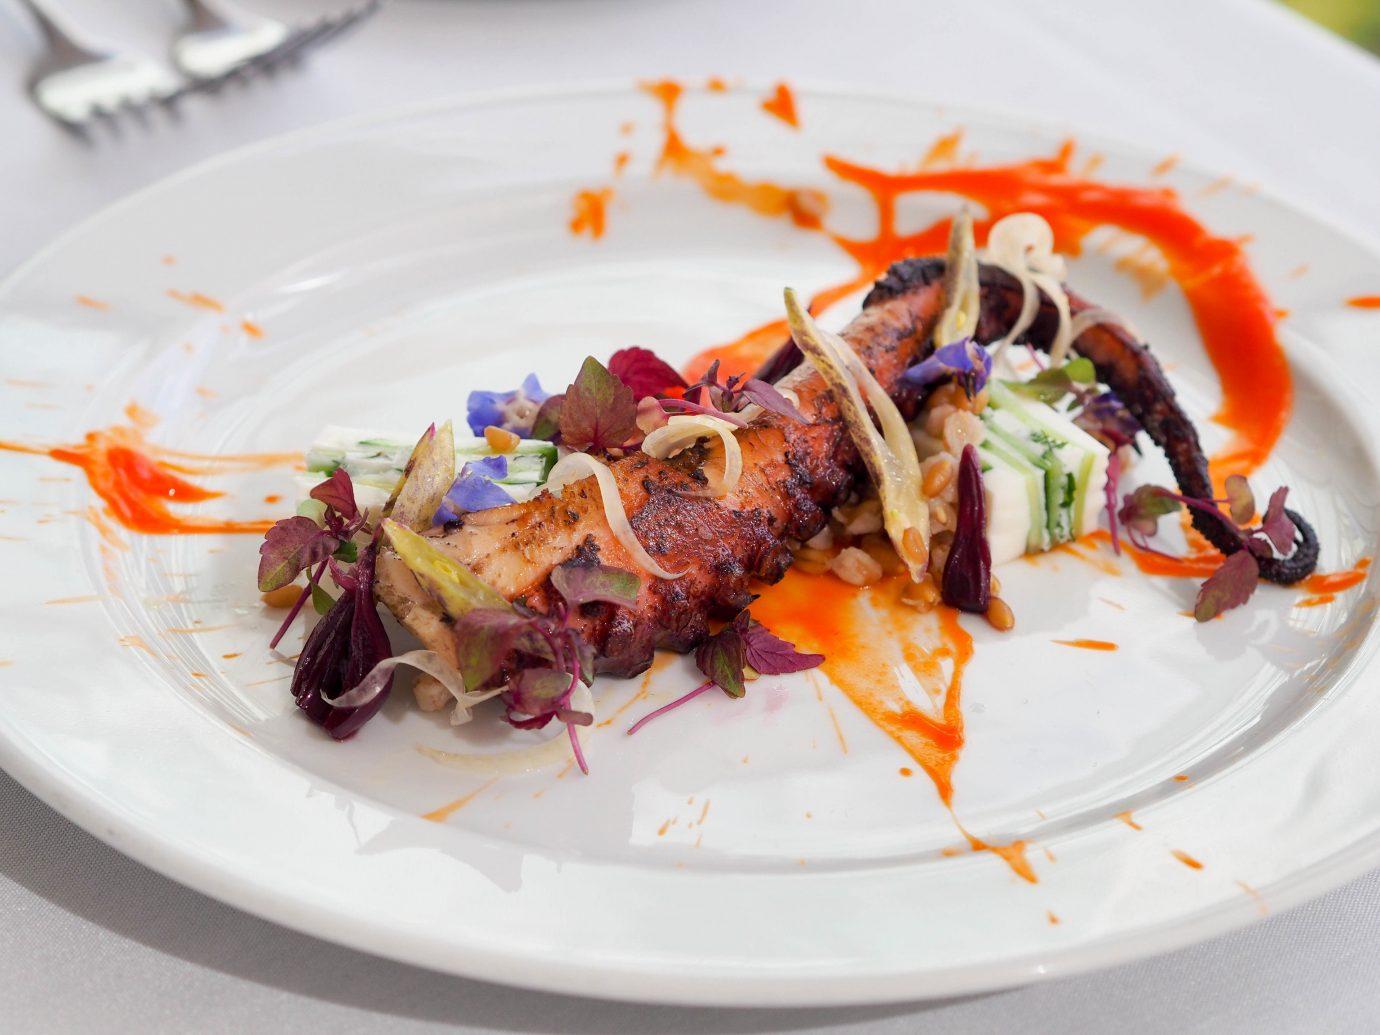 Road Trips Trip Ideas plate food table dish white indoor cuisine piece Seafood animal source foods mediterranean food recipe appetizer greek food grilled food meat eaten meal arranged piece de resistance